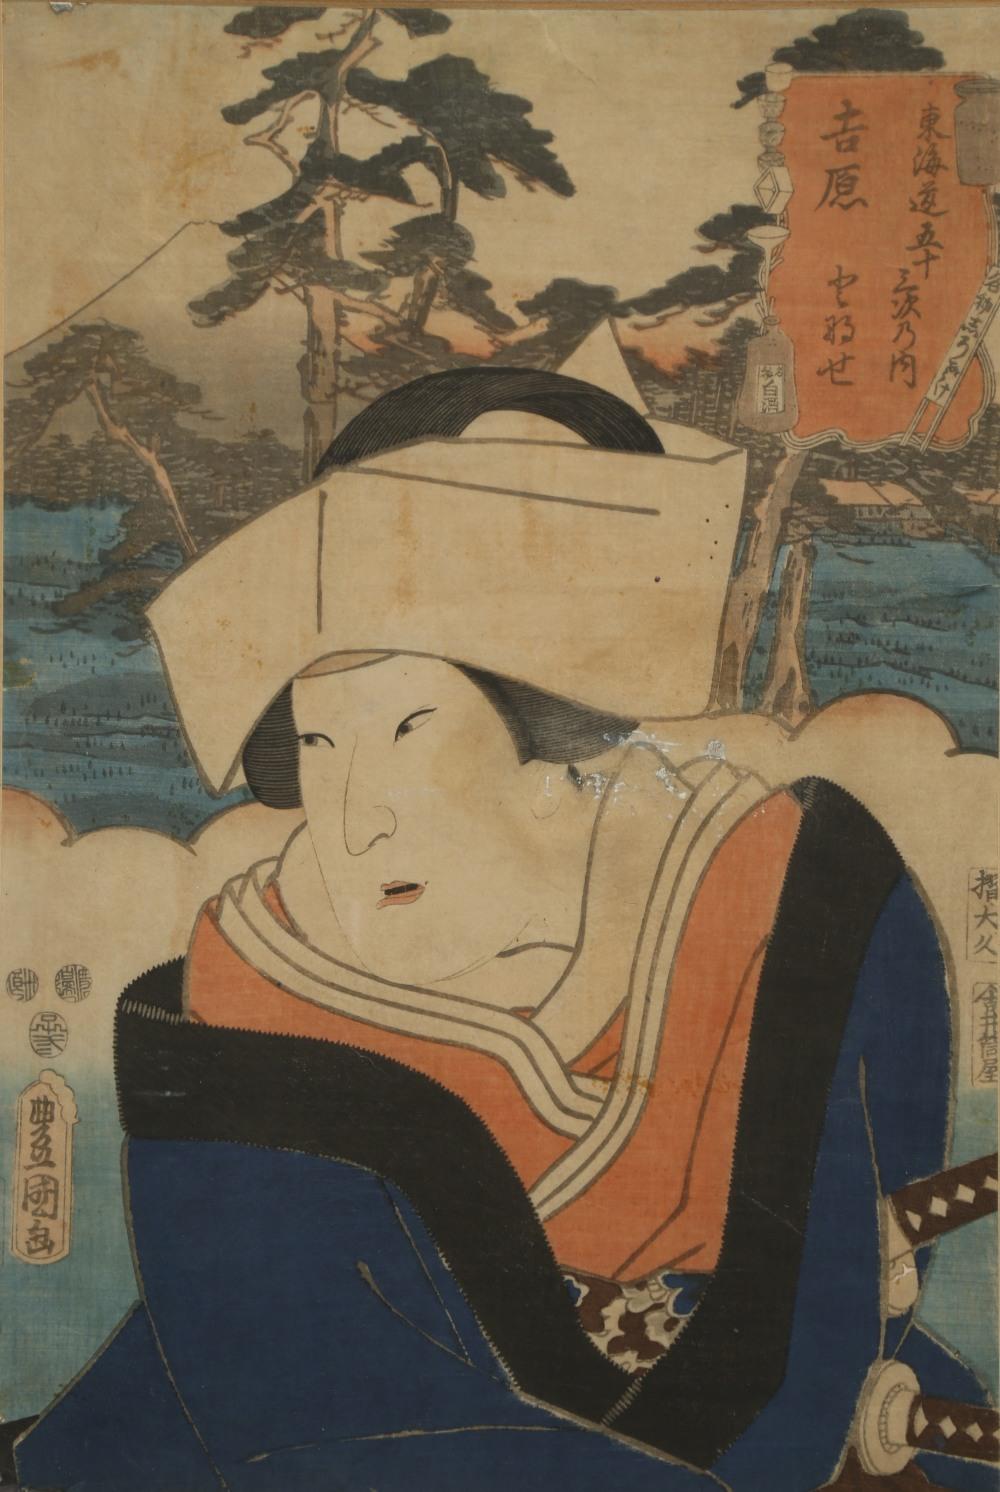 A COLLECTION OF TWELVE JAPANESE WOODBLOCK PRINTS BY UTAGAWA KUNISADA (1786-1864) MEIJI PERIOD, - Image 7 of 12